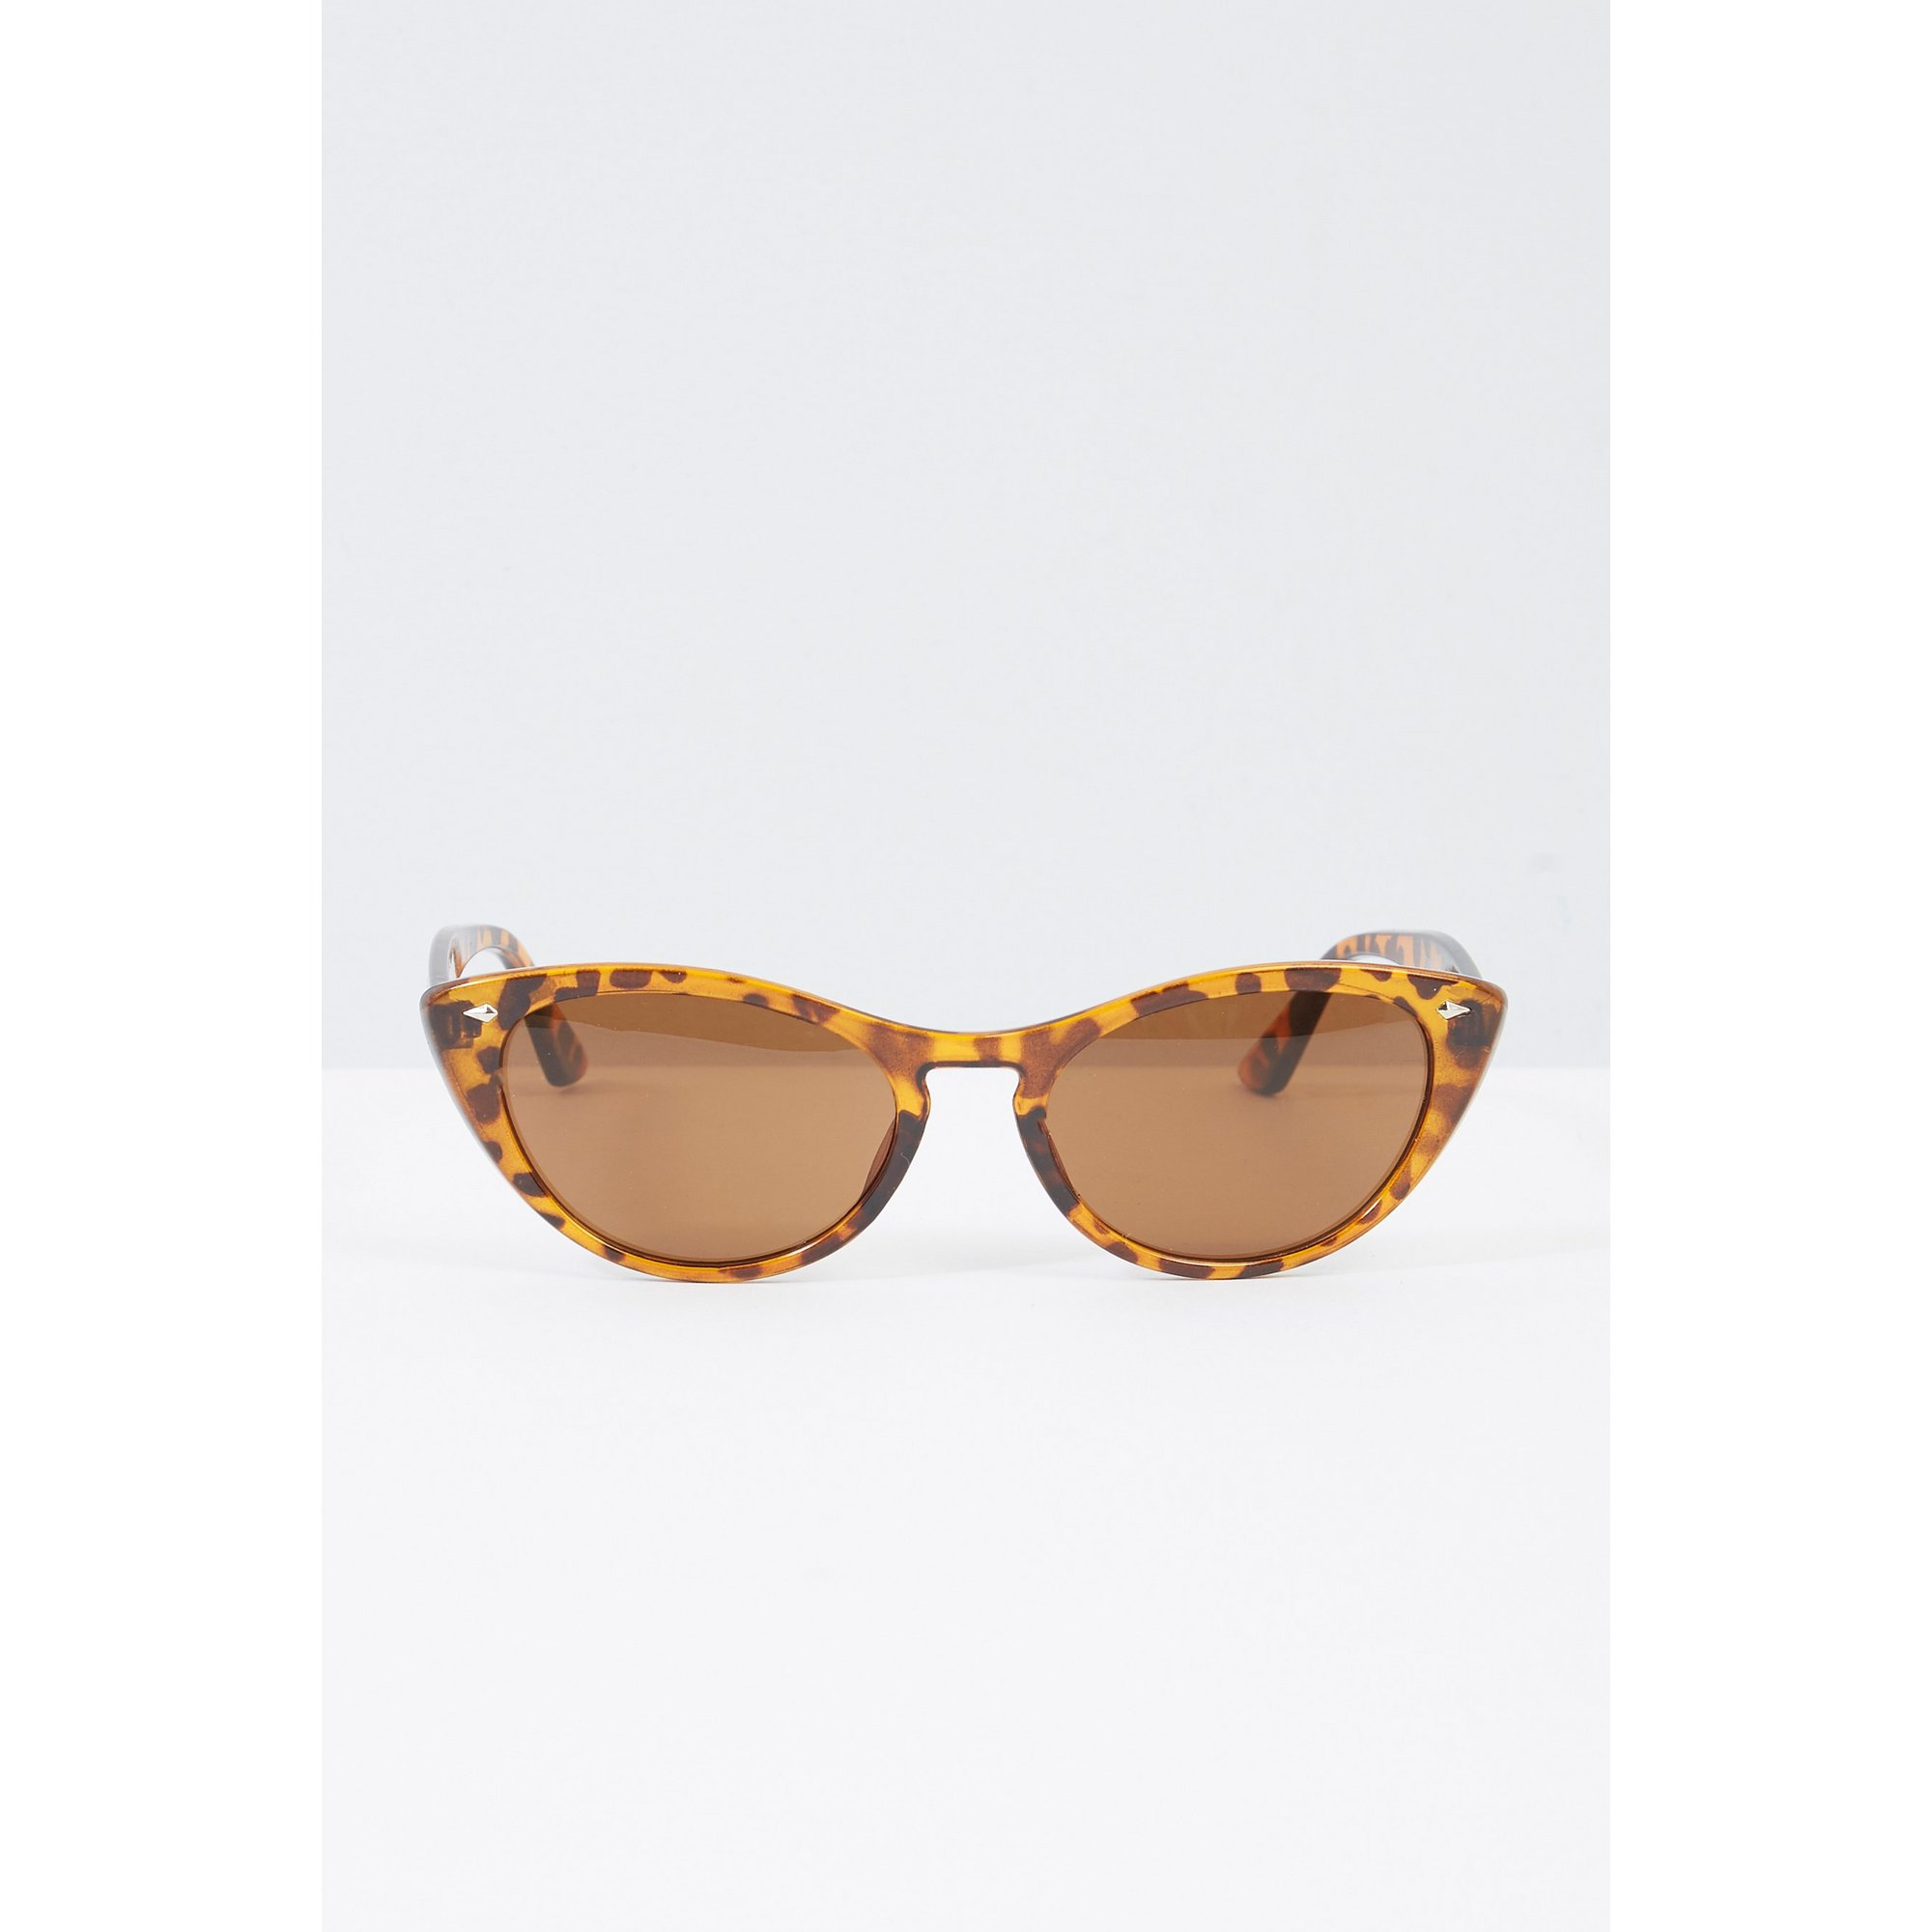 Image of Cat Eye Sunglasses